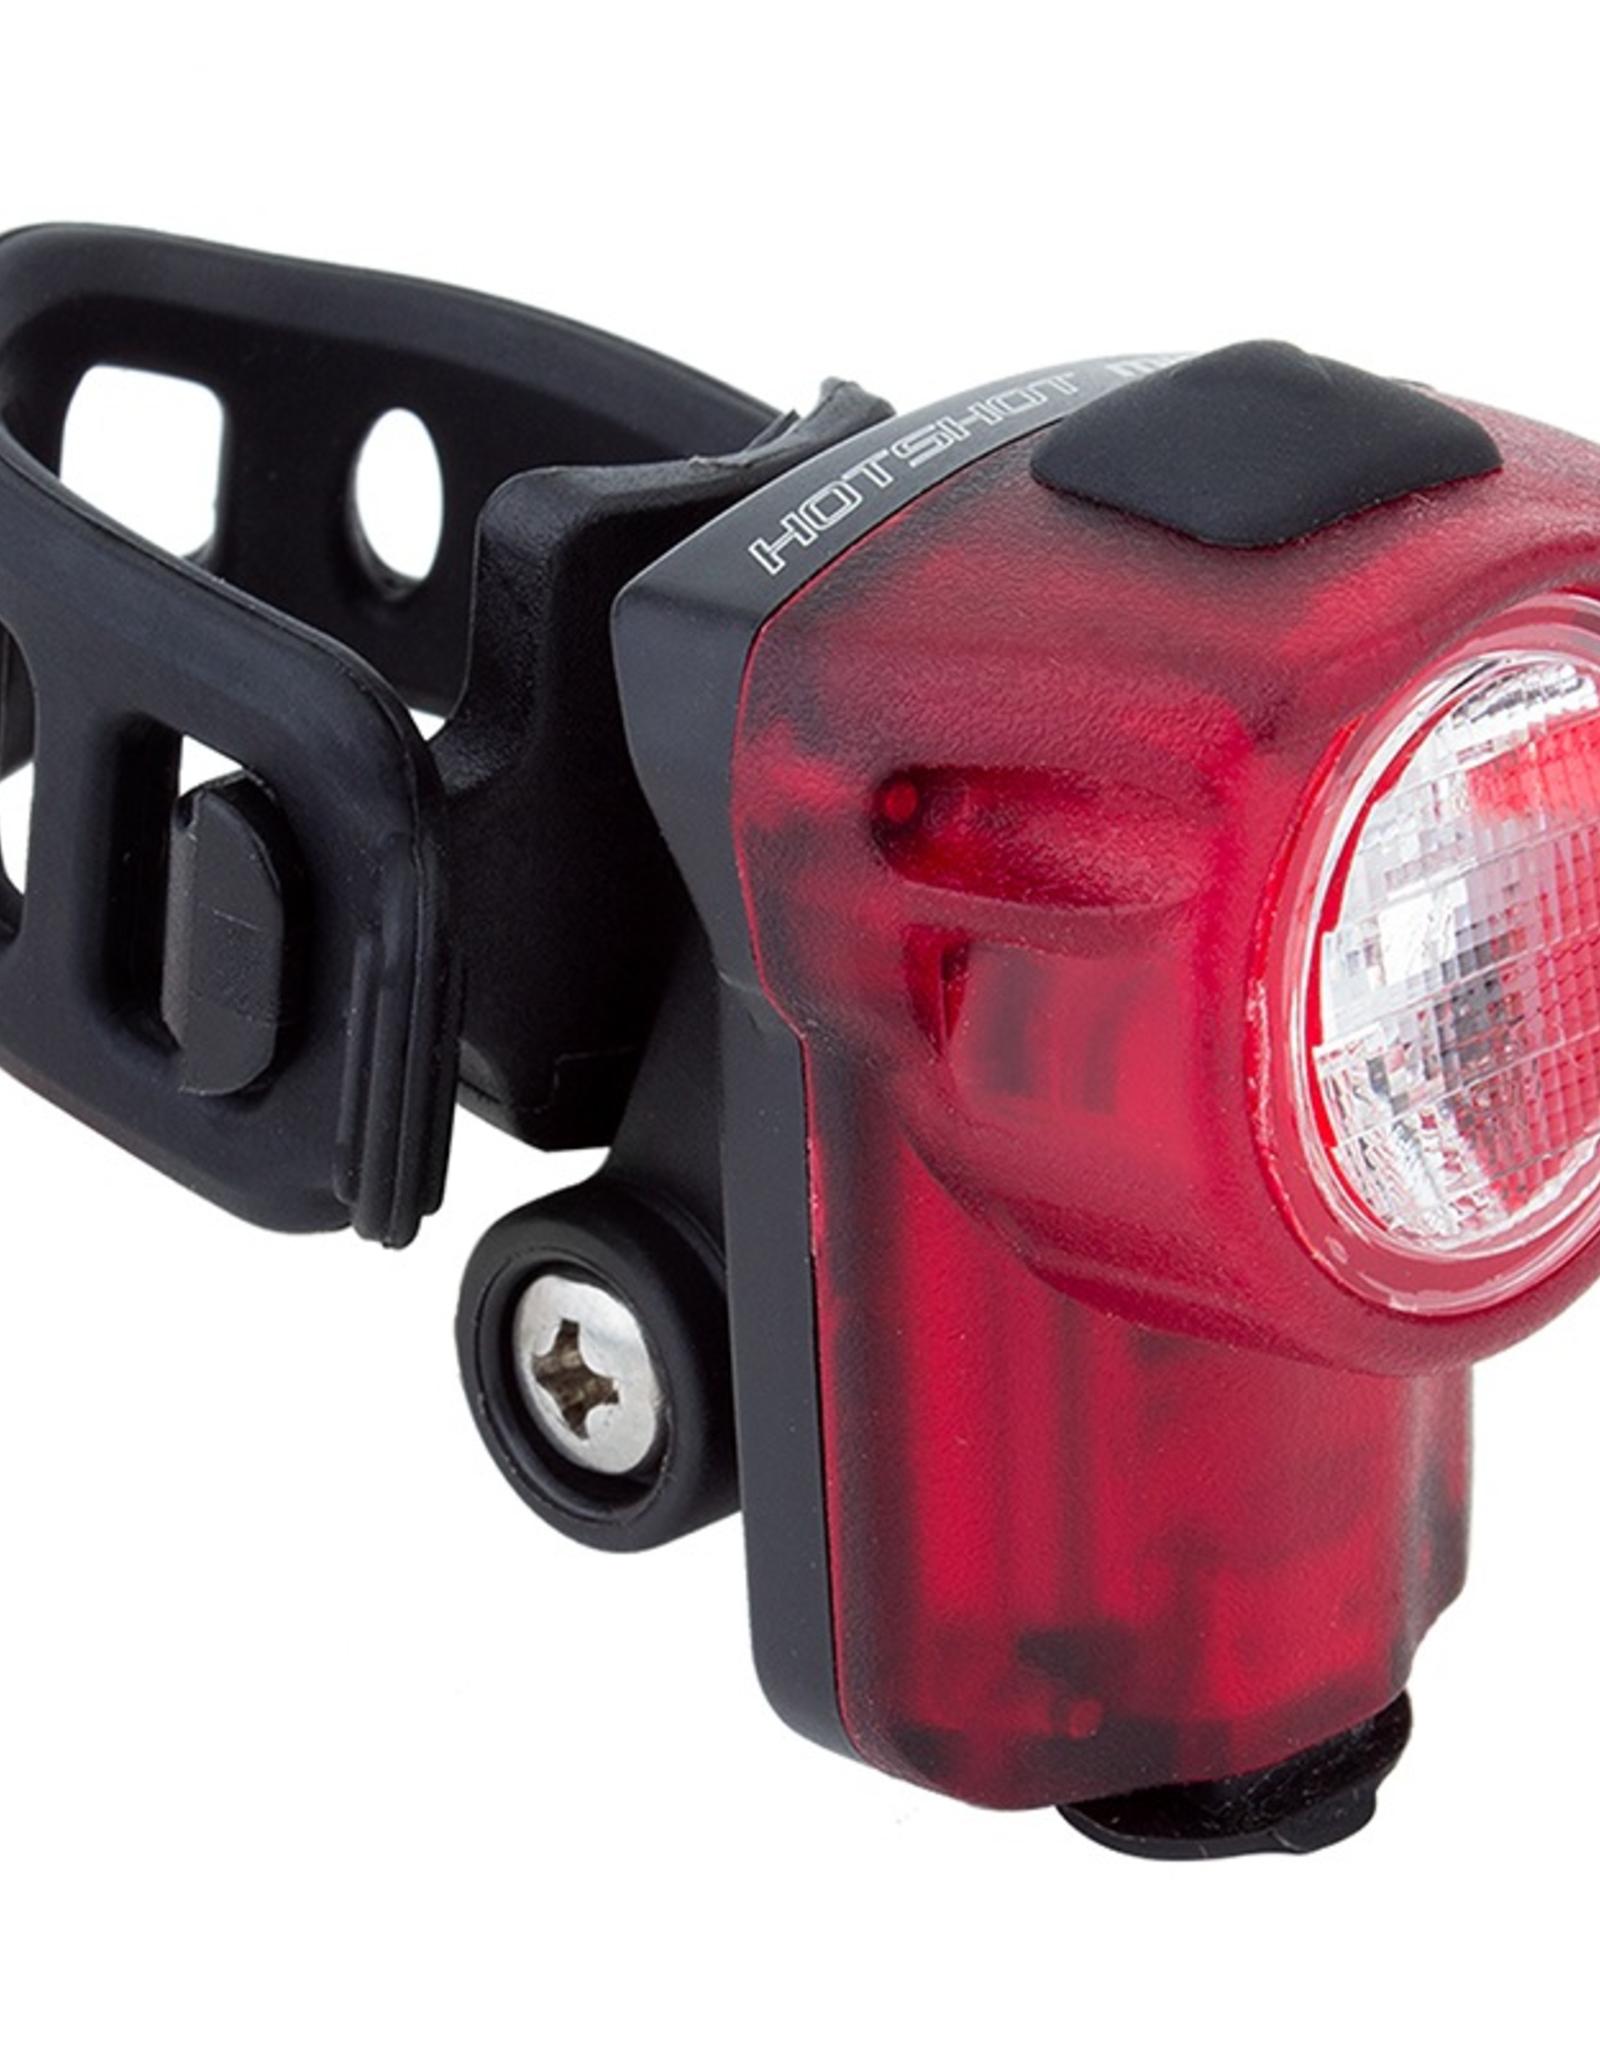 Cygolite Cygolite Hotshot SL 50 Micro USB Rechargeable LED Tail Light